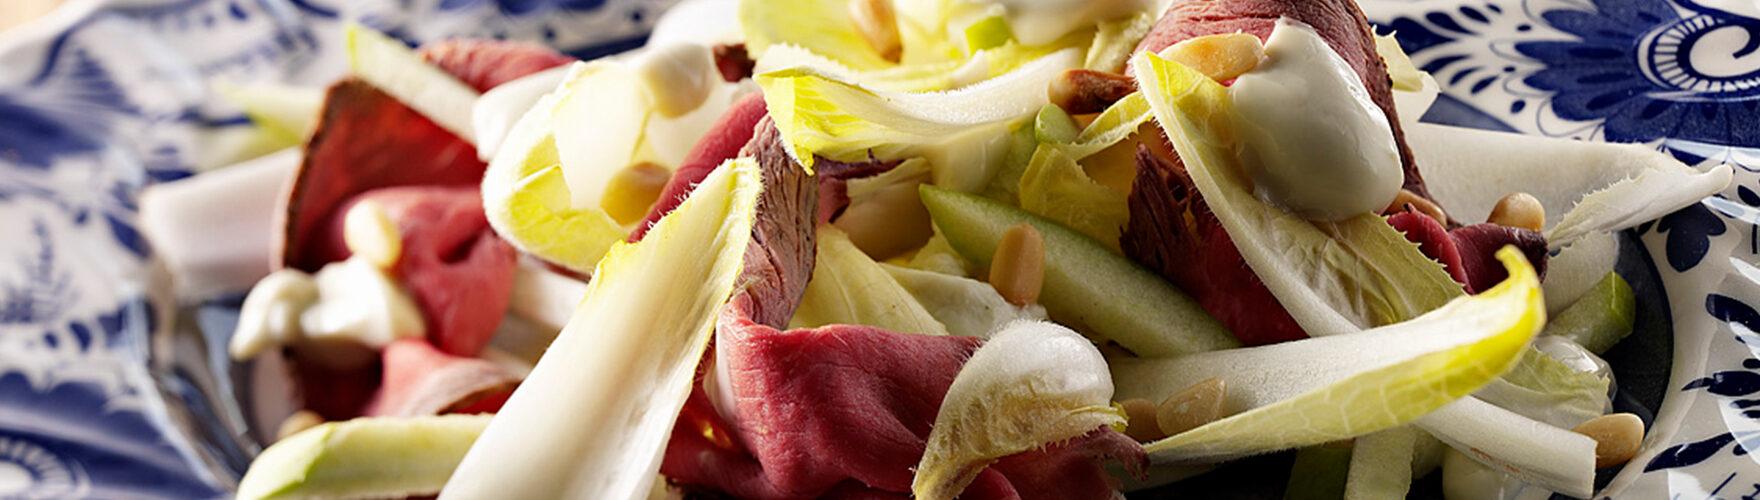 Salade aux endives, rosbif et ERU Crème au Bleu